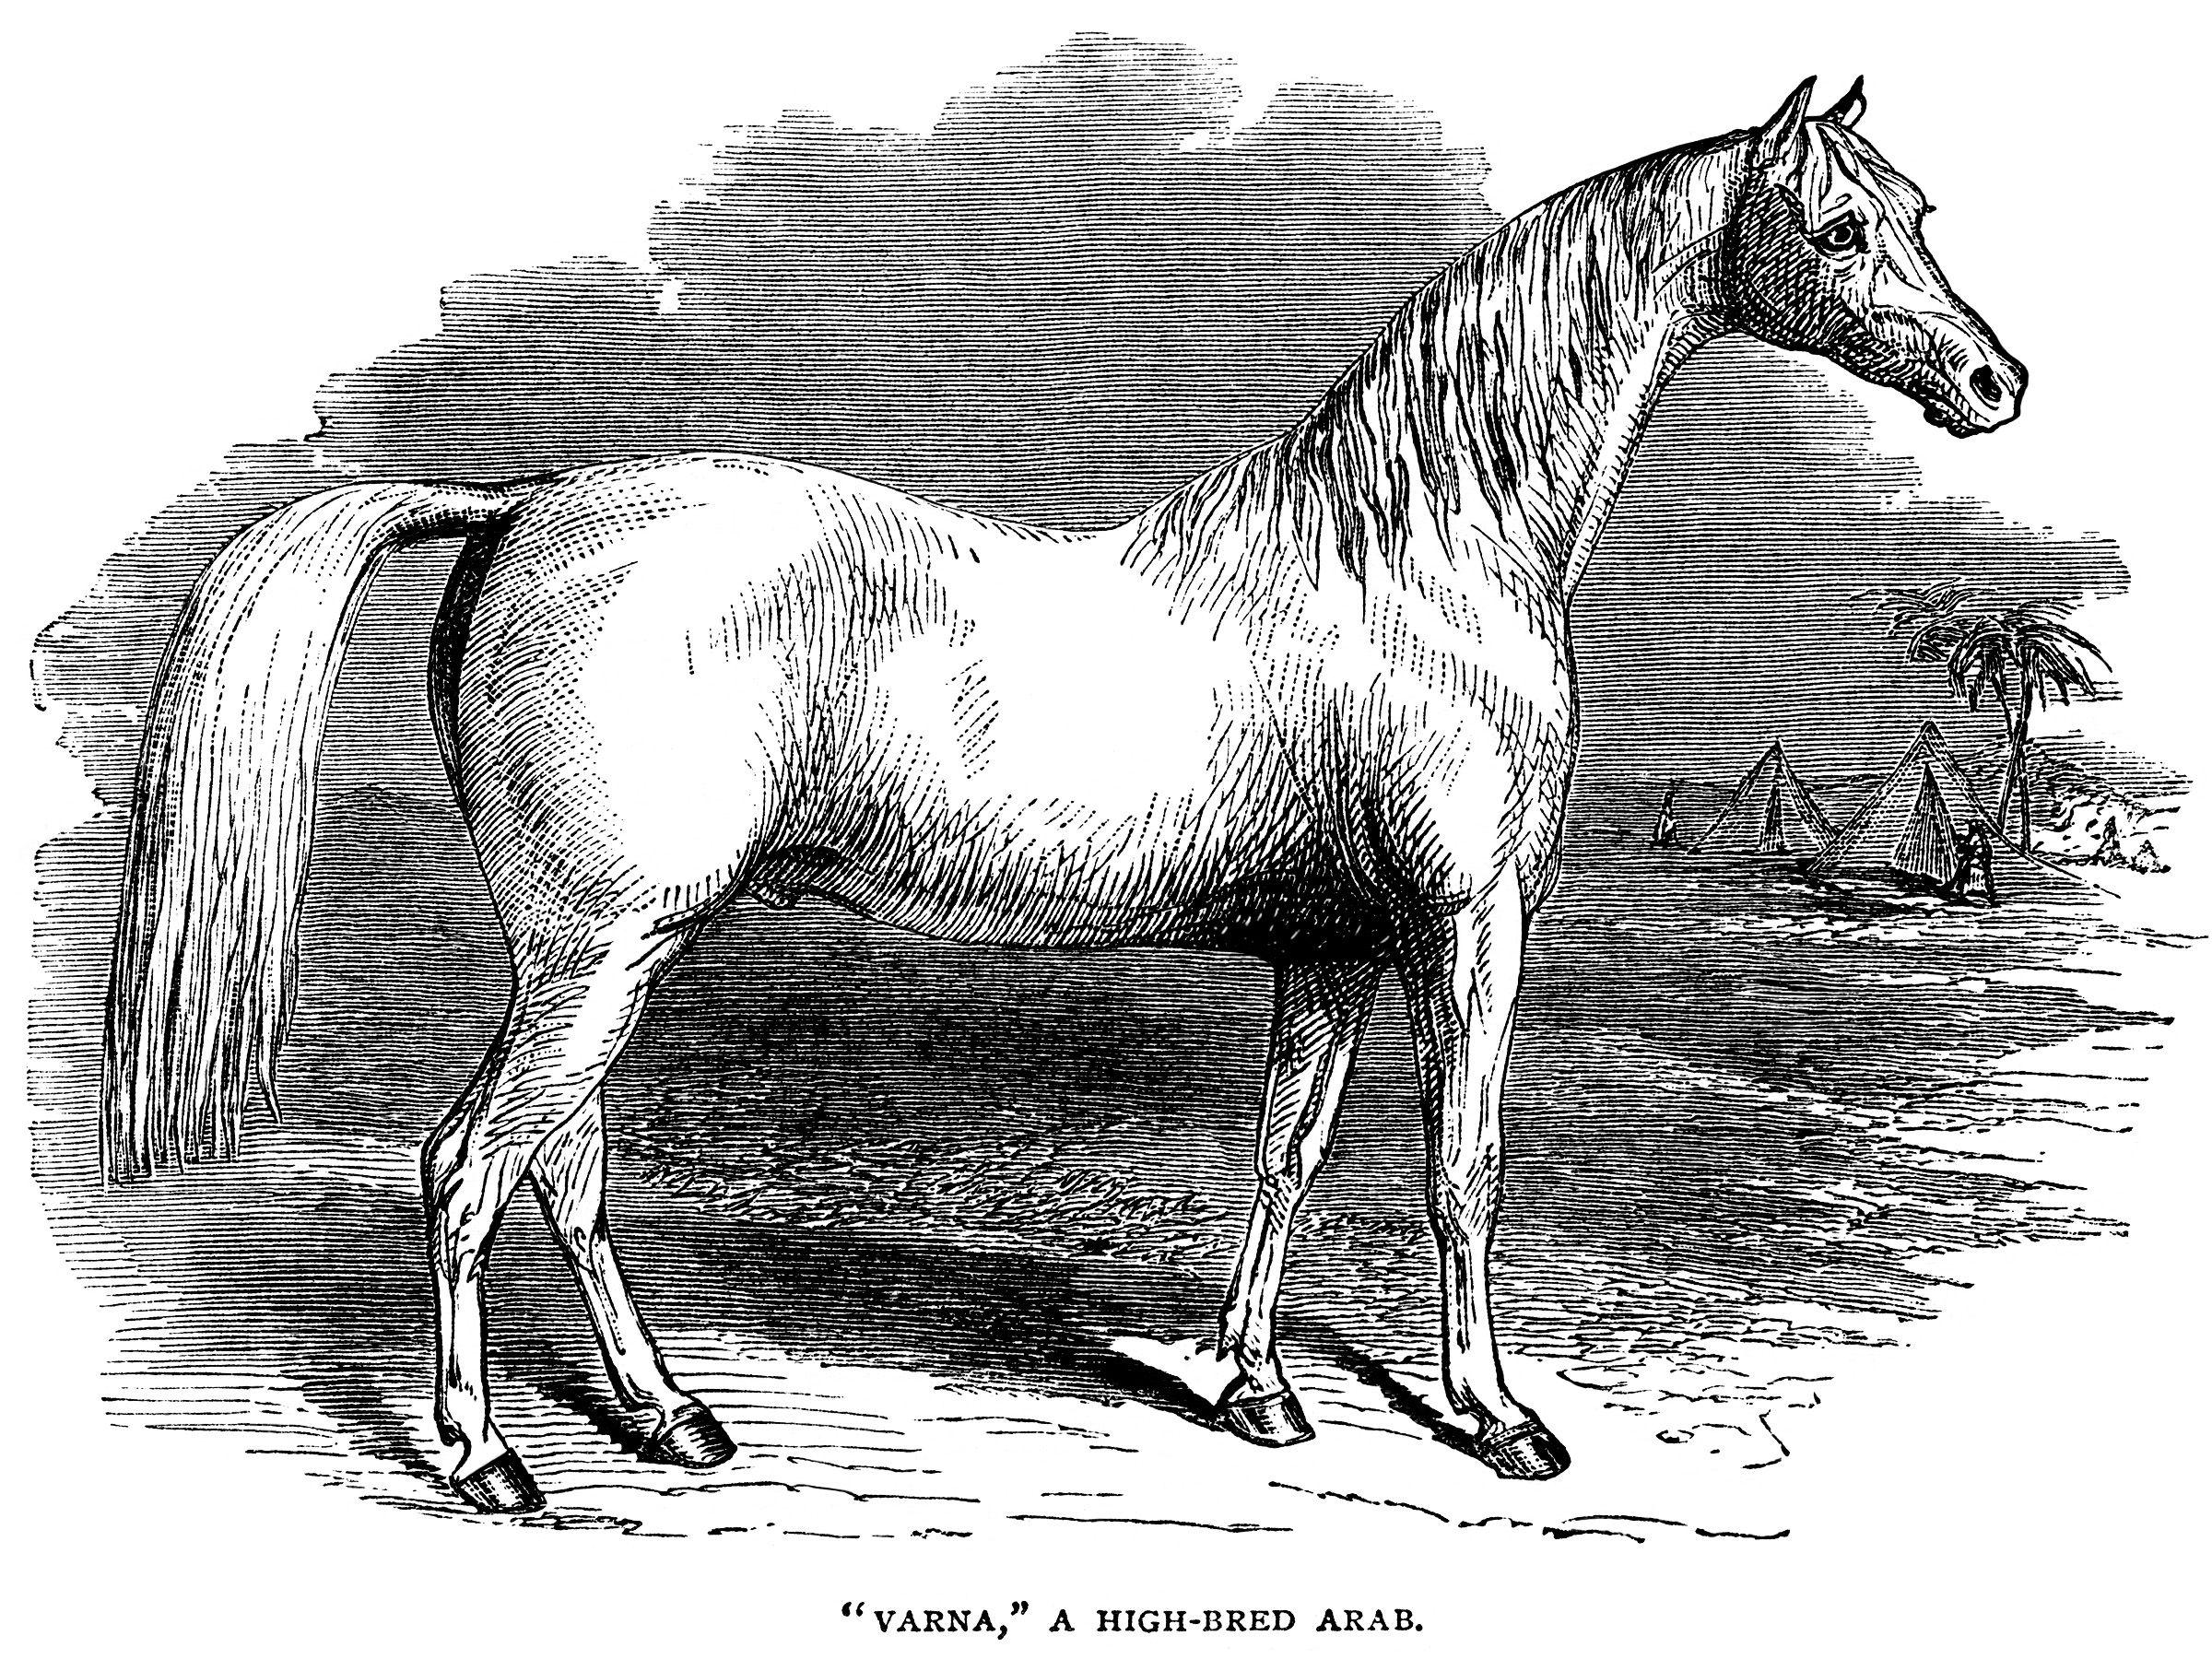 black and white clip art, farm animal clipart, arab horse.